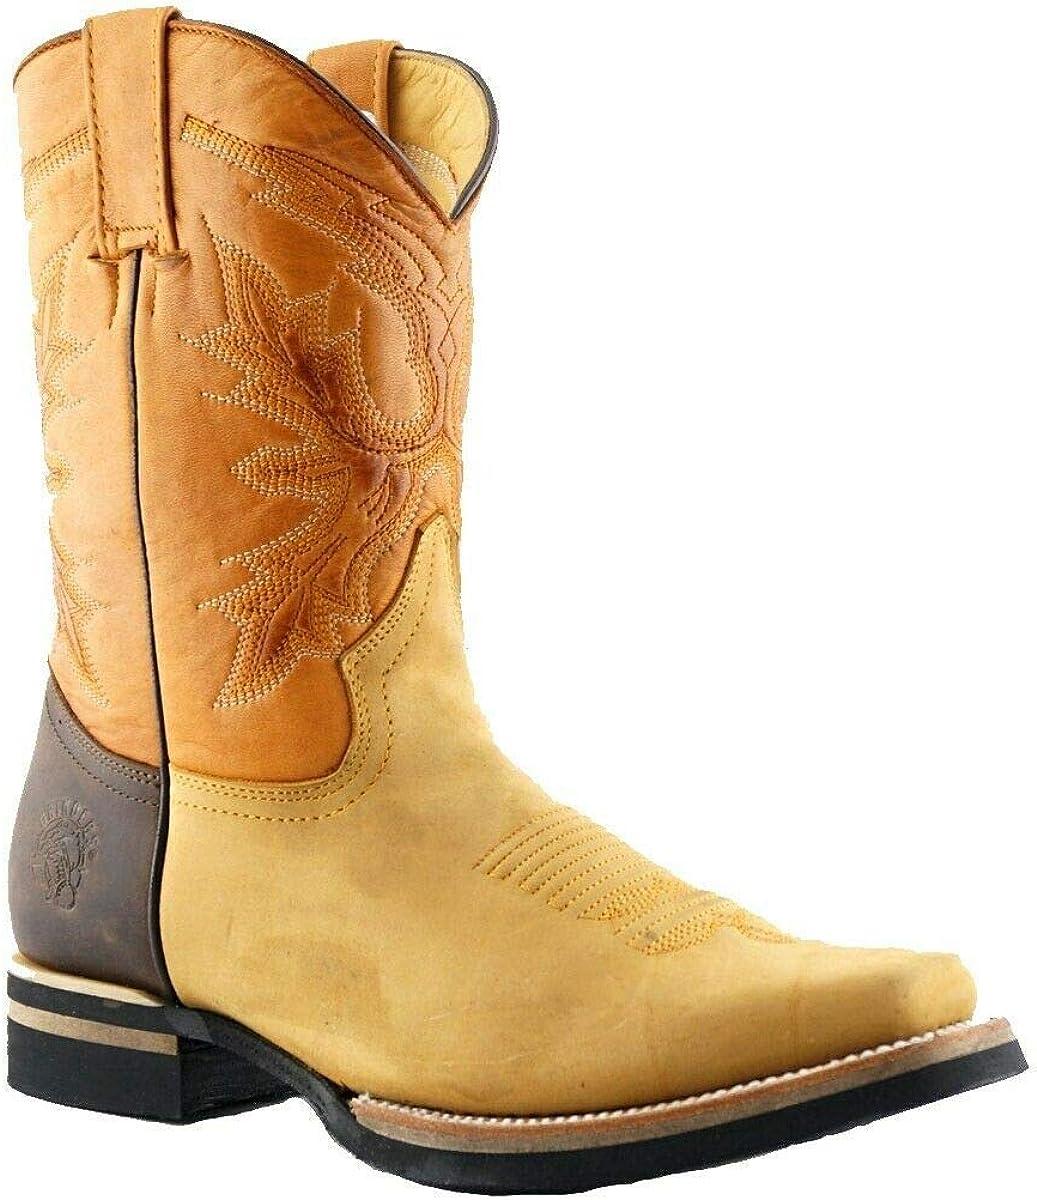 Grinders Unisex El Paso Tan Brown Leather Slip On Mid Calf Cowboy Western Boots